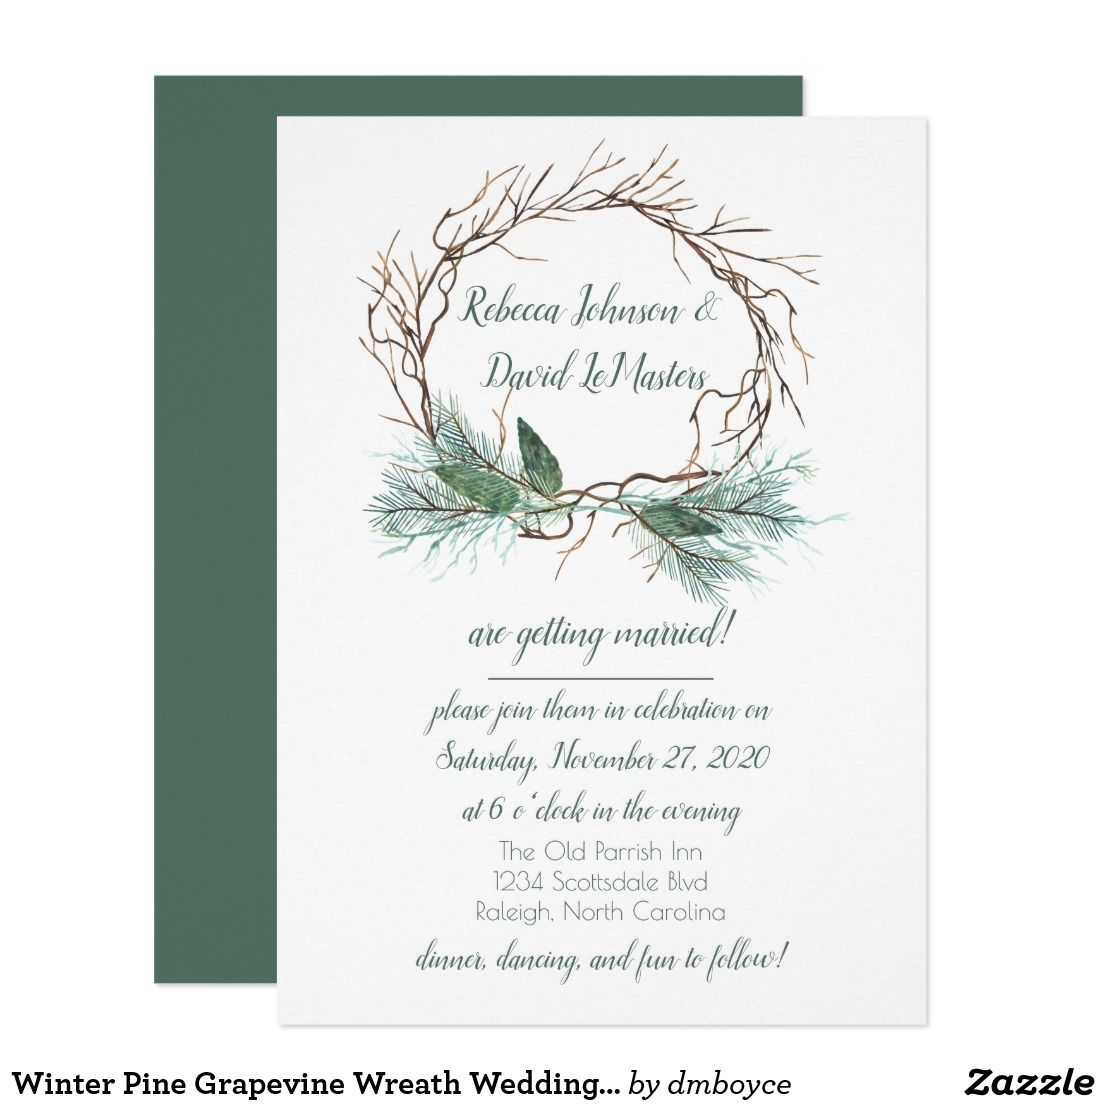 Winter Pine Grapevine Wreath Wedding Invitation